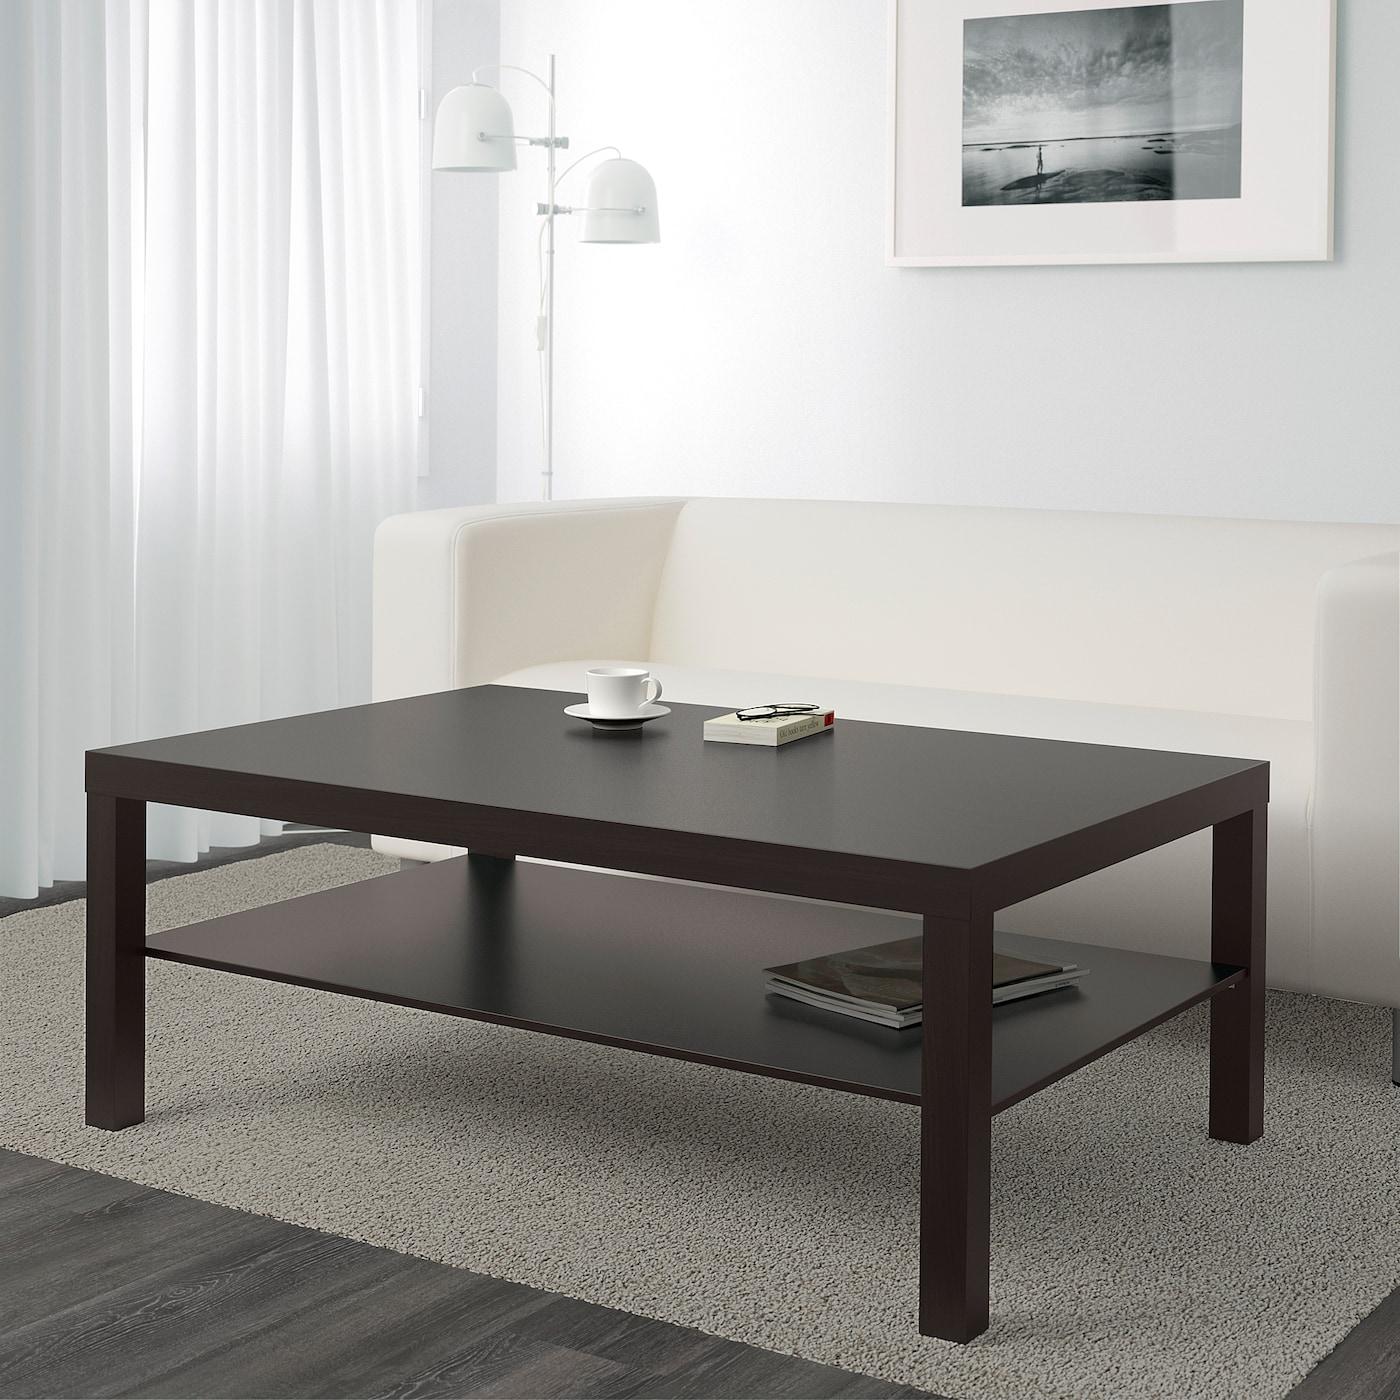 Lack Coffee Table Black Brown 118x78 Cm Ikea Ireland [ 1400 x 1400 Pixel ]